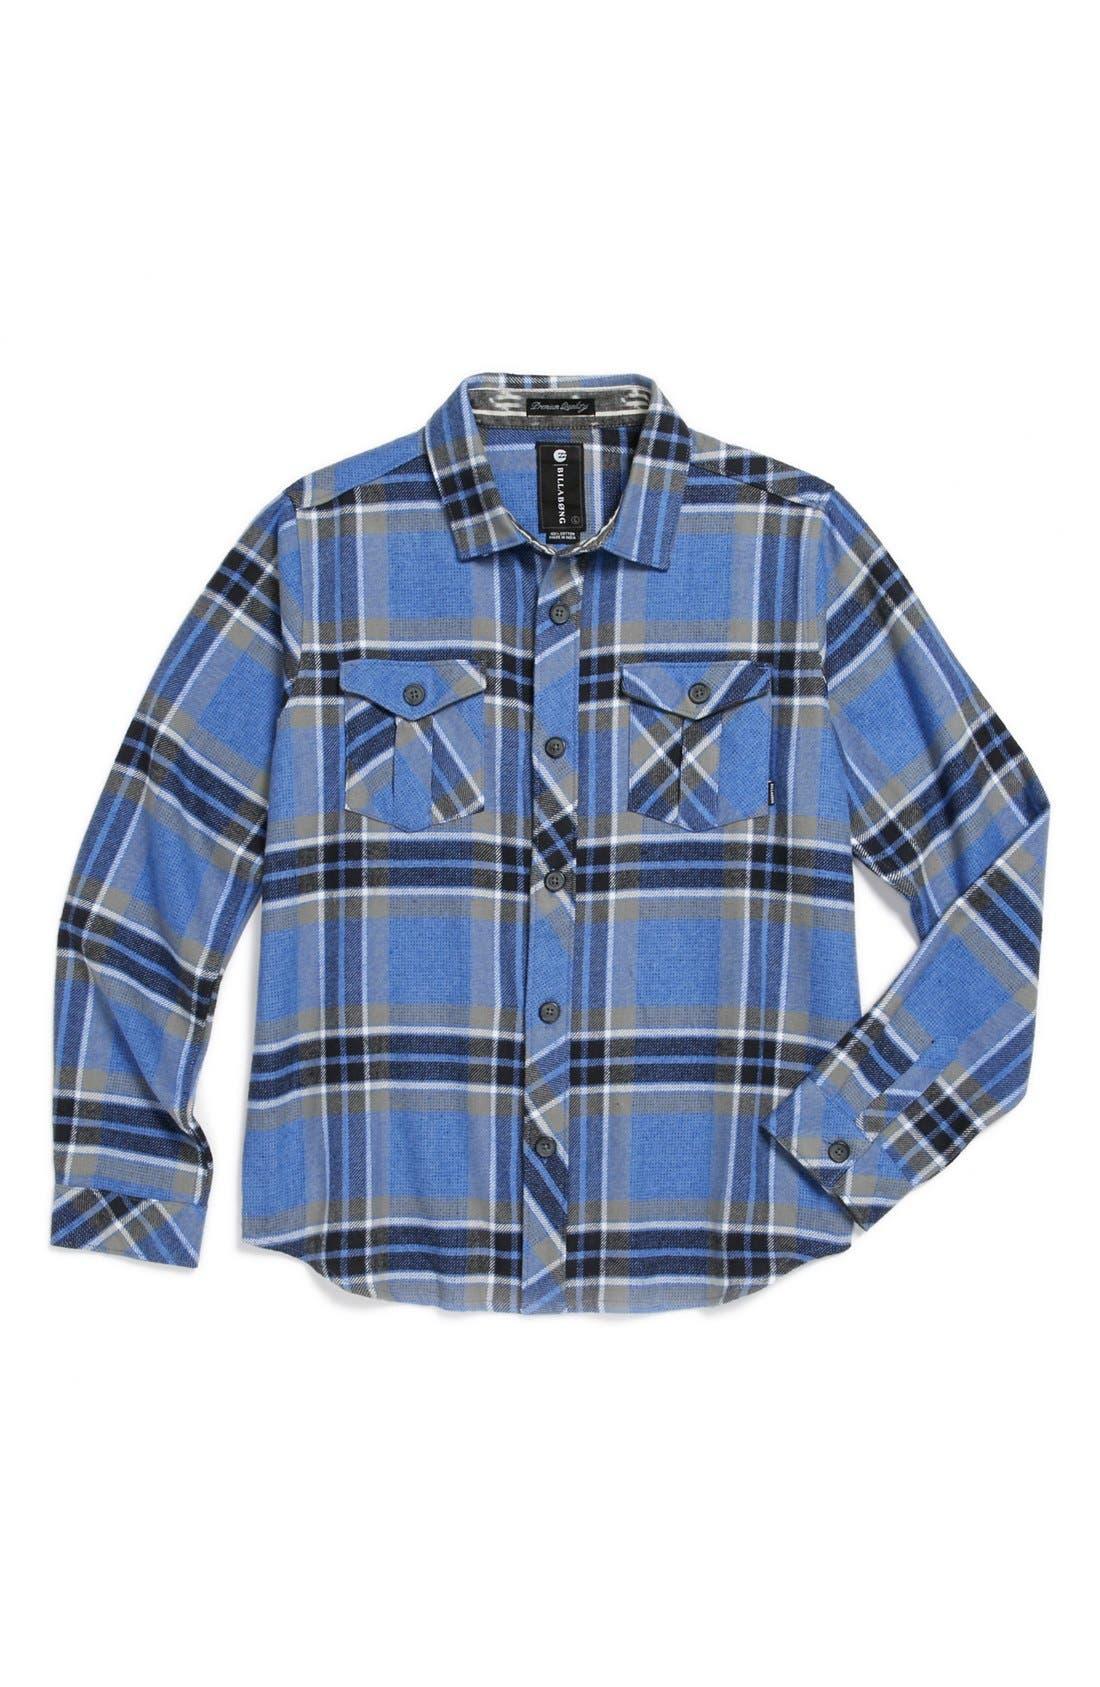 Main Image - Billabong 'Woodland' Flannel Sport Shirt (Big Boys)